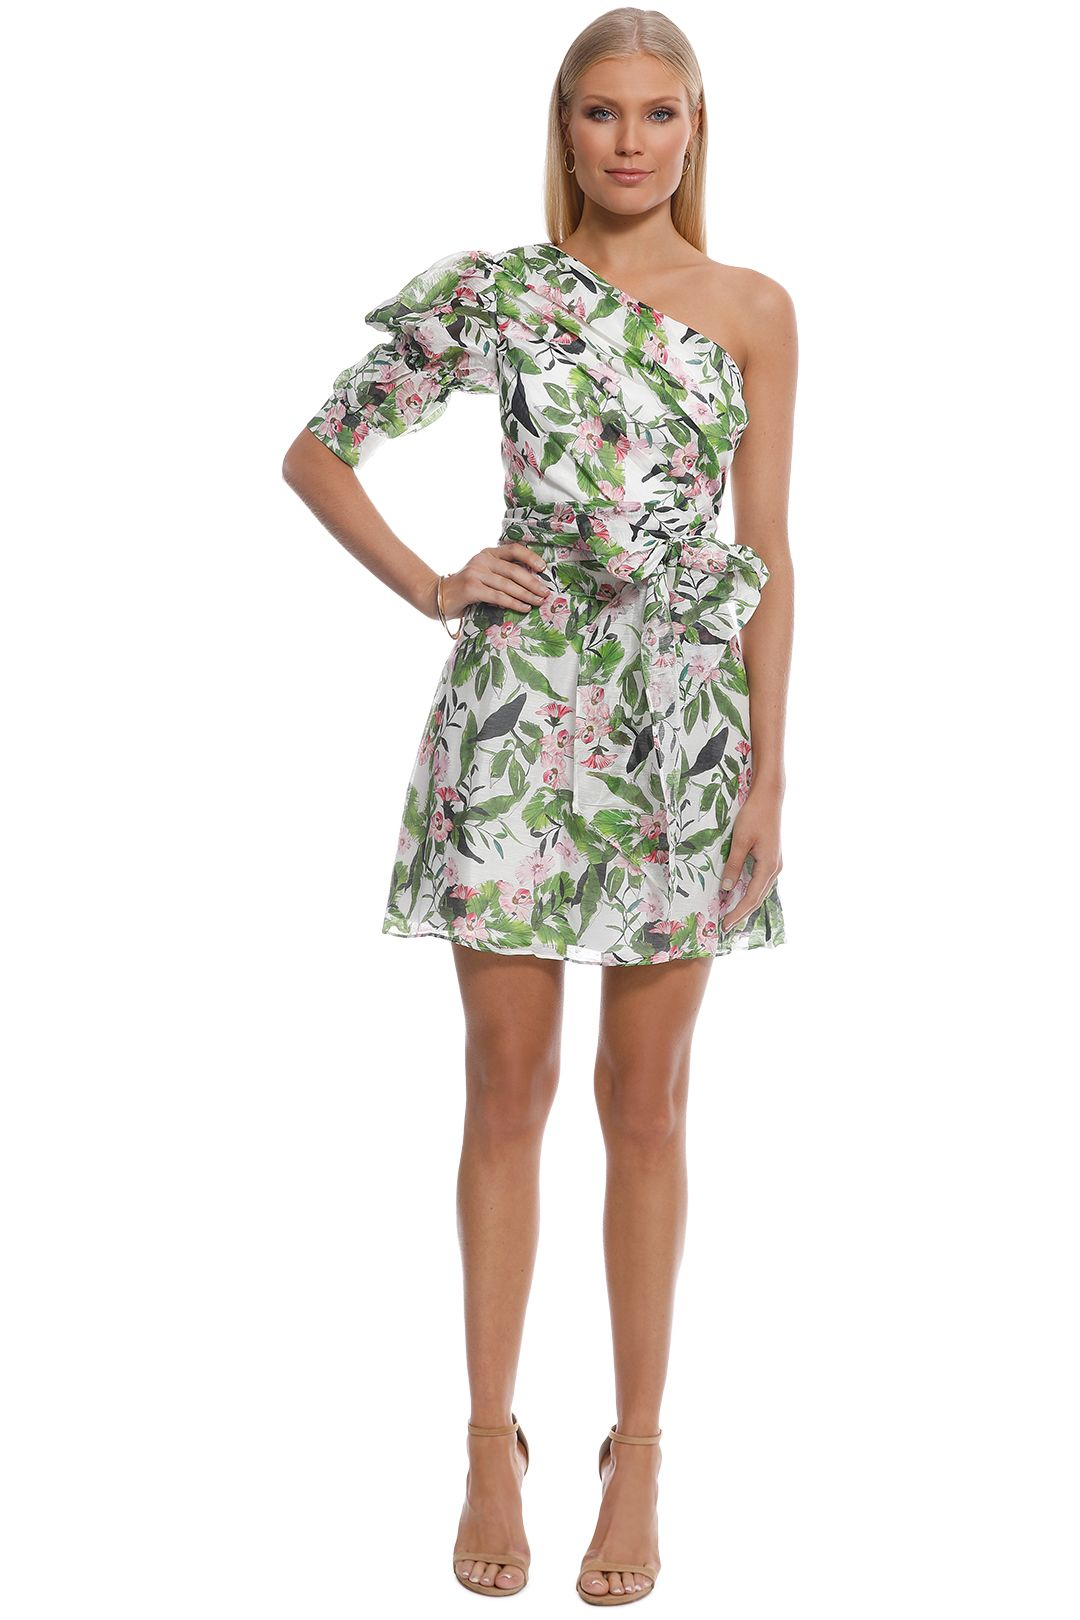 Talulah - Tropo Dreams Mini Dress - Tropical Bloom - Front